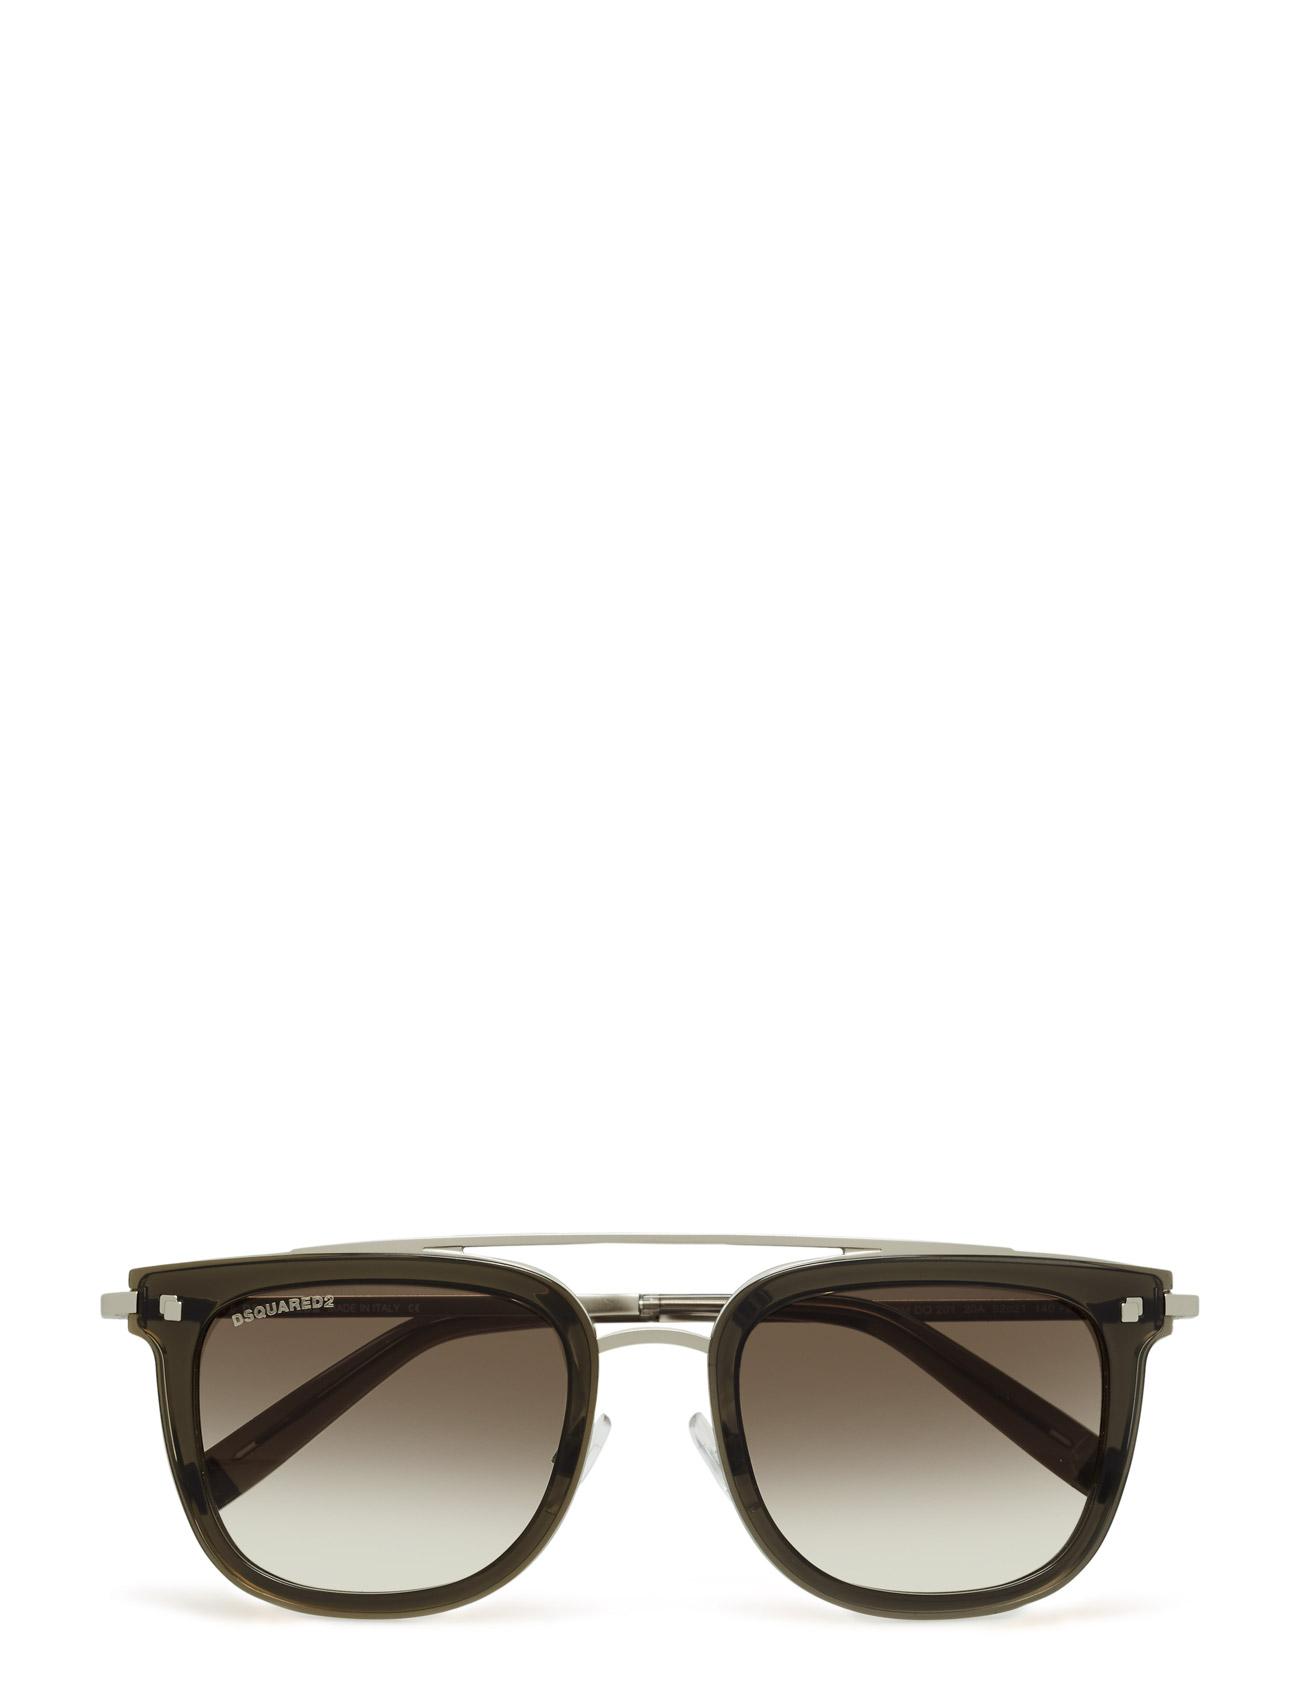 Dq0201 DSQUARED2 Sunglasses Solbriller til Damer i